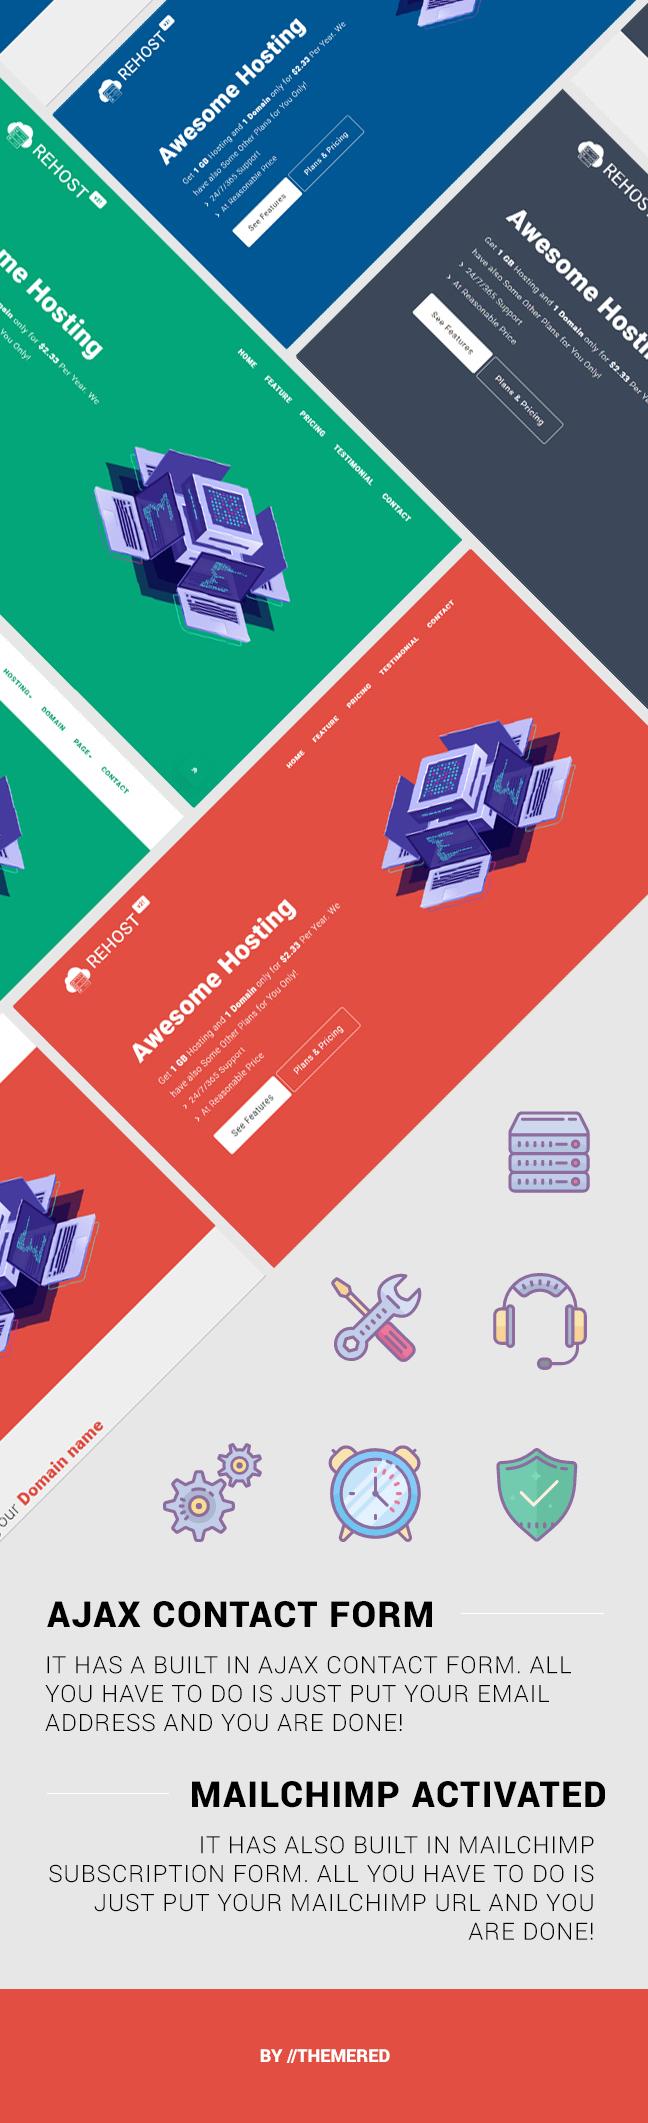 Rehost - HTML5 Responsive Hosting Template - 3